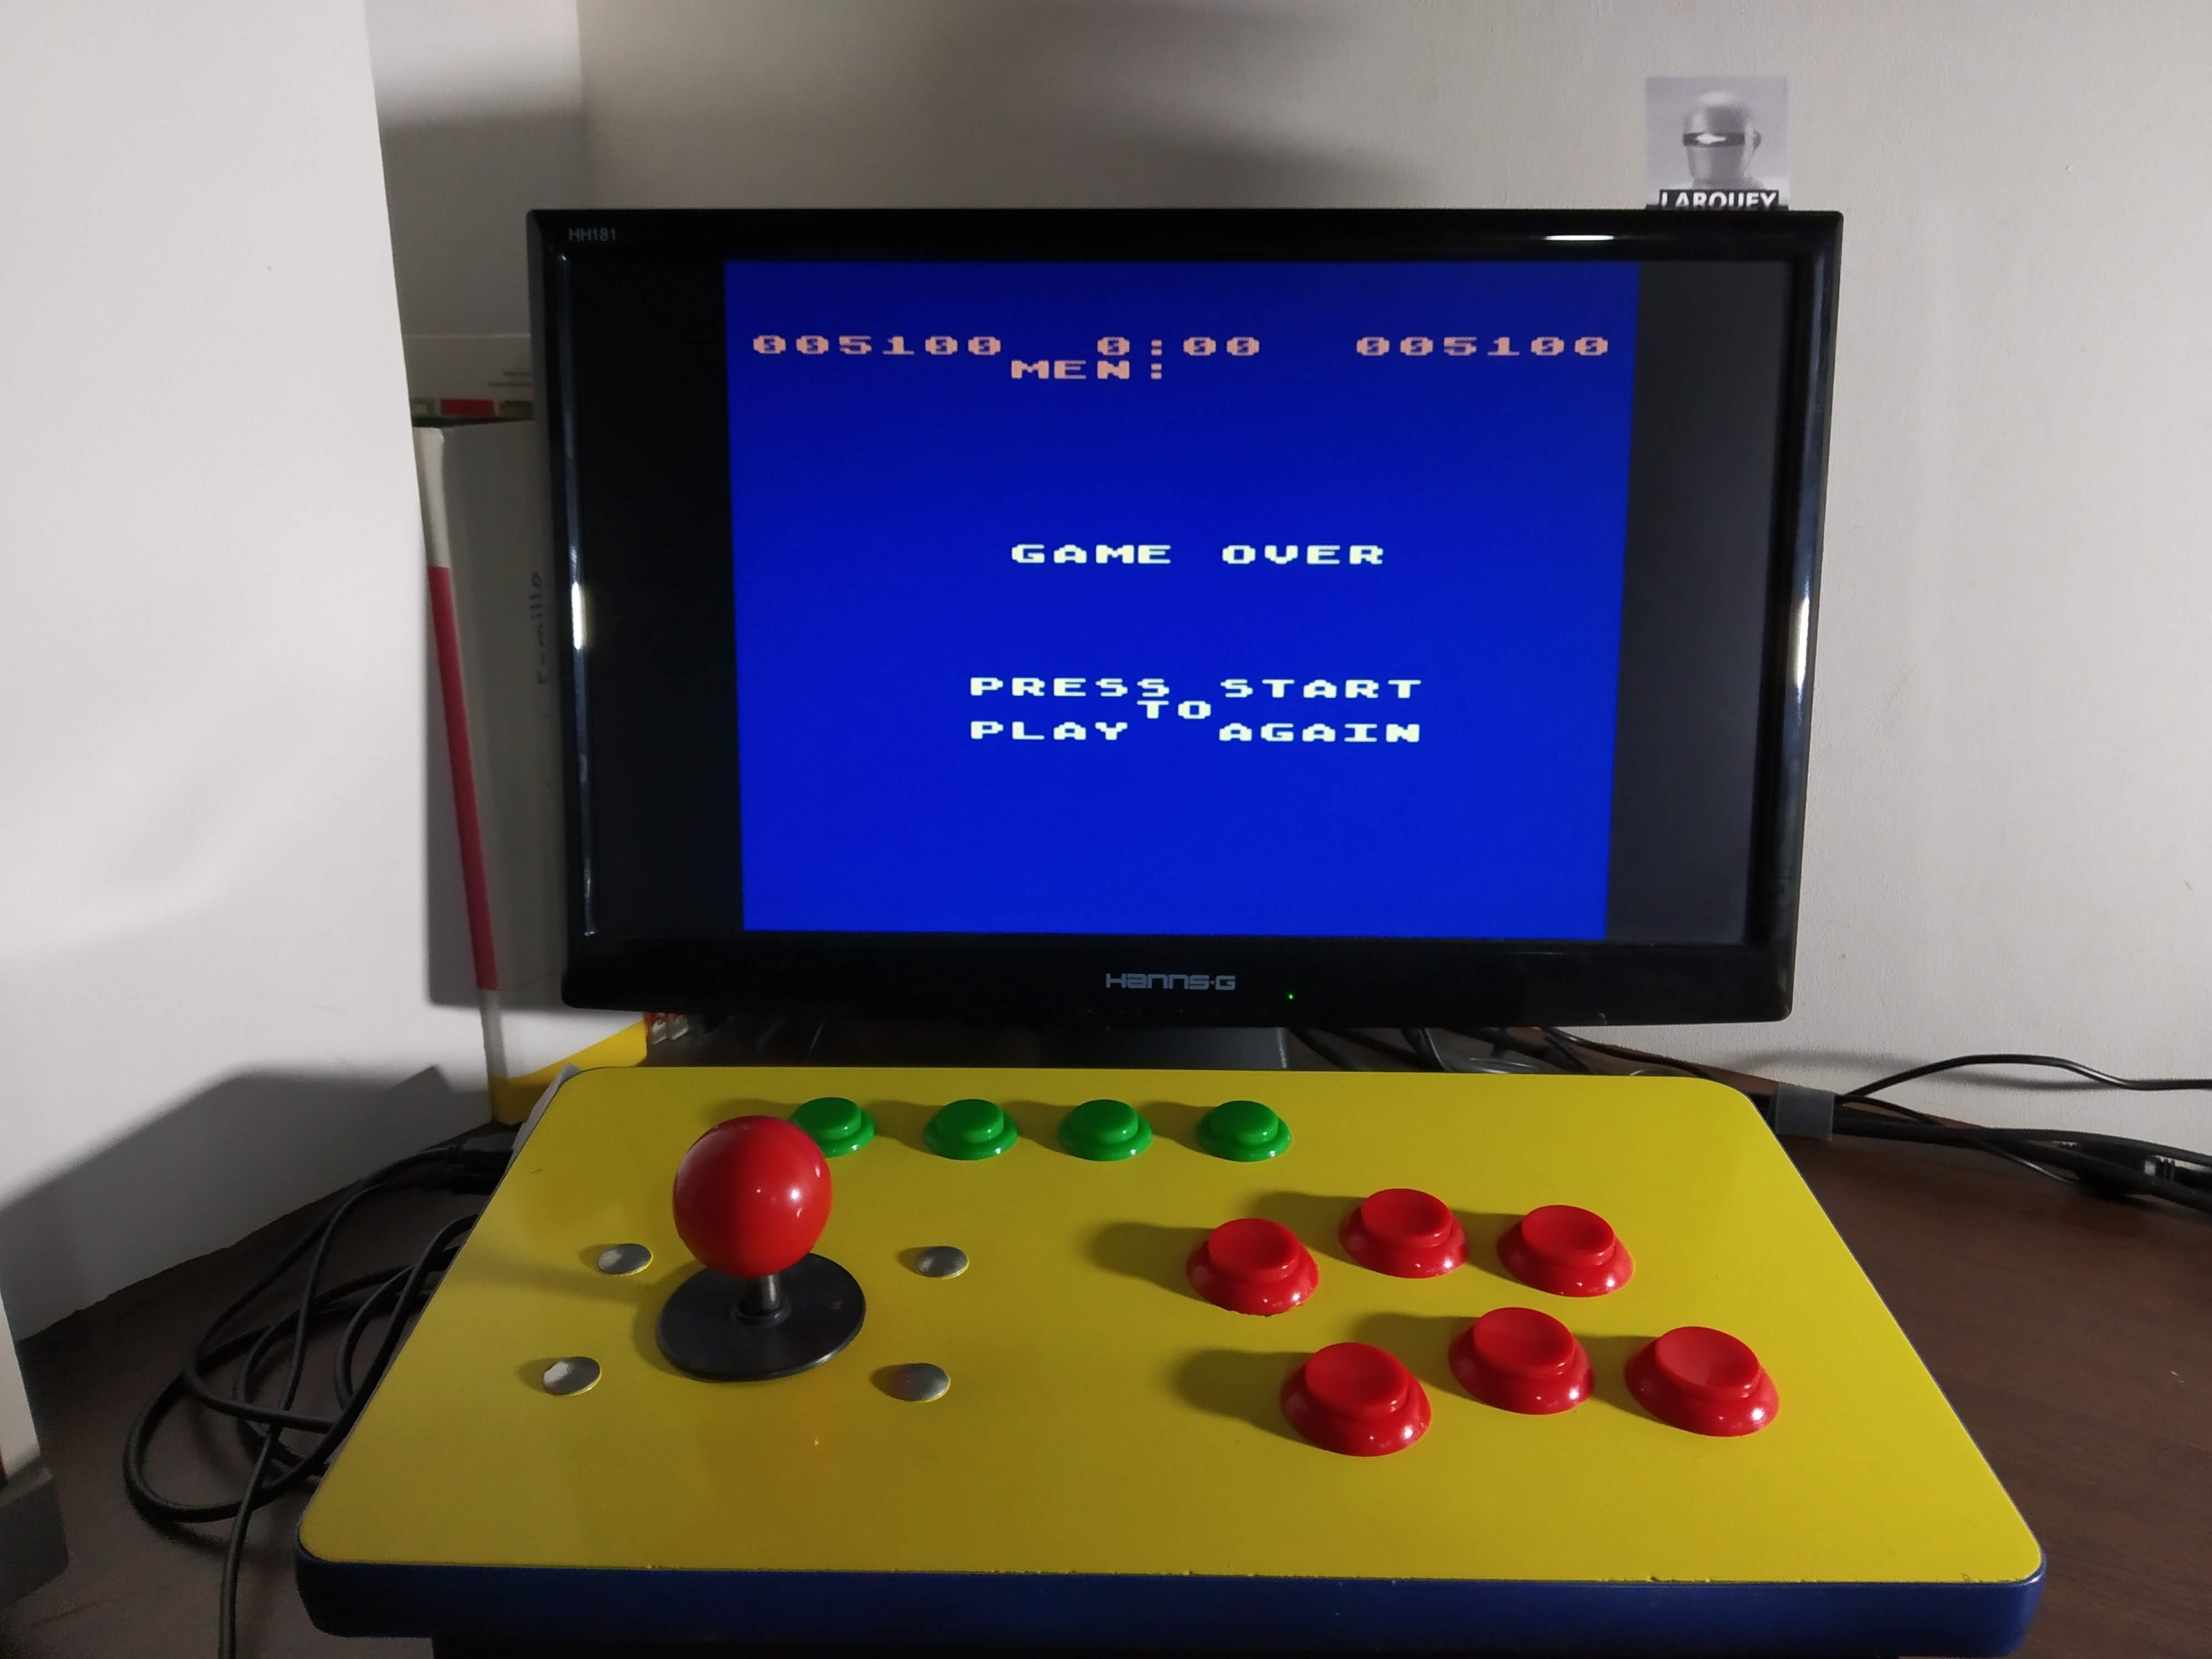 Larquey: Buffalo Stampede [Advanced] (Atari 400/800/XL/XE Emulated) 5,100 points on 2019-12-15 03:29:44